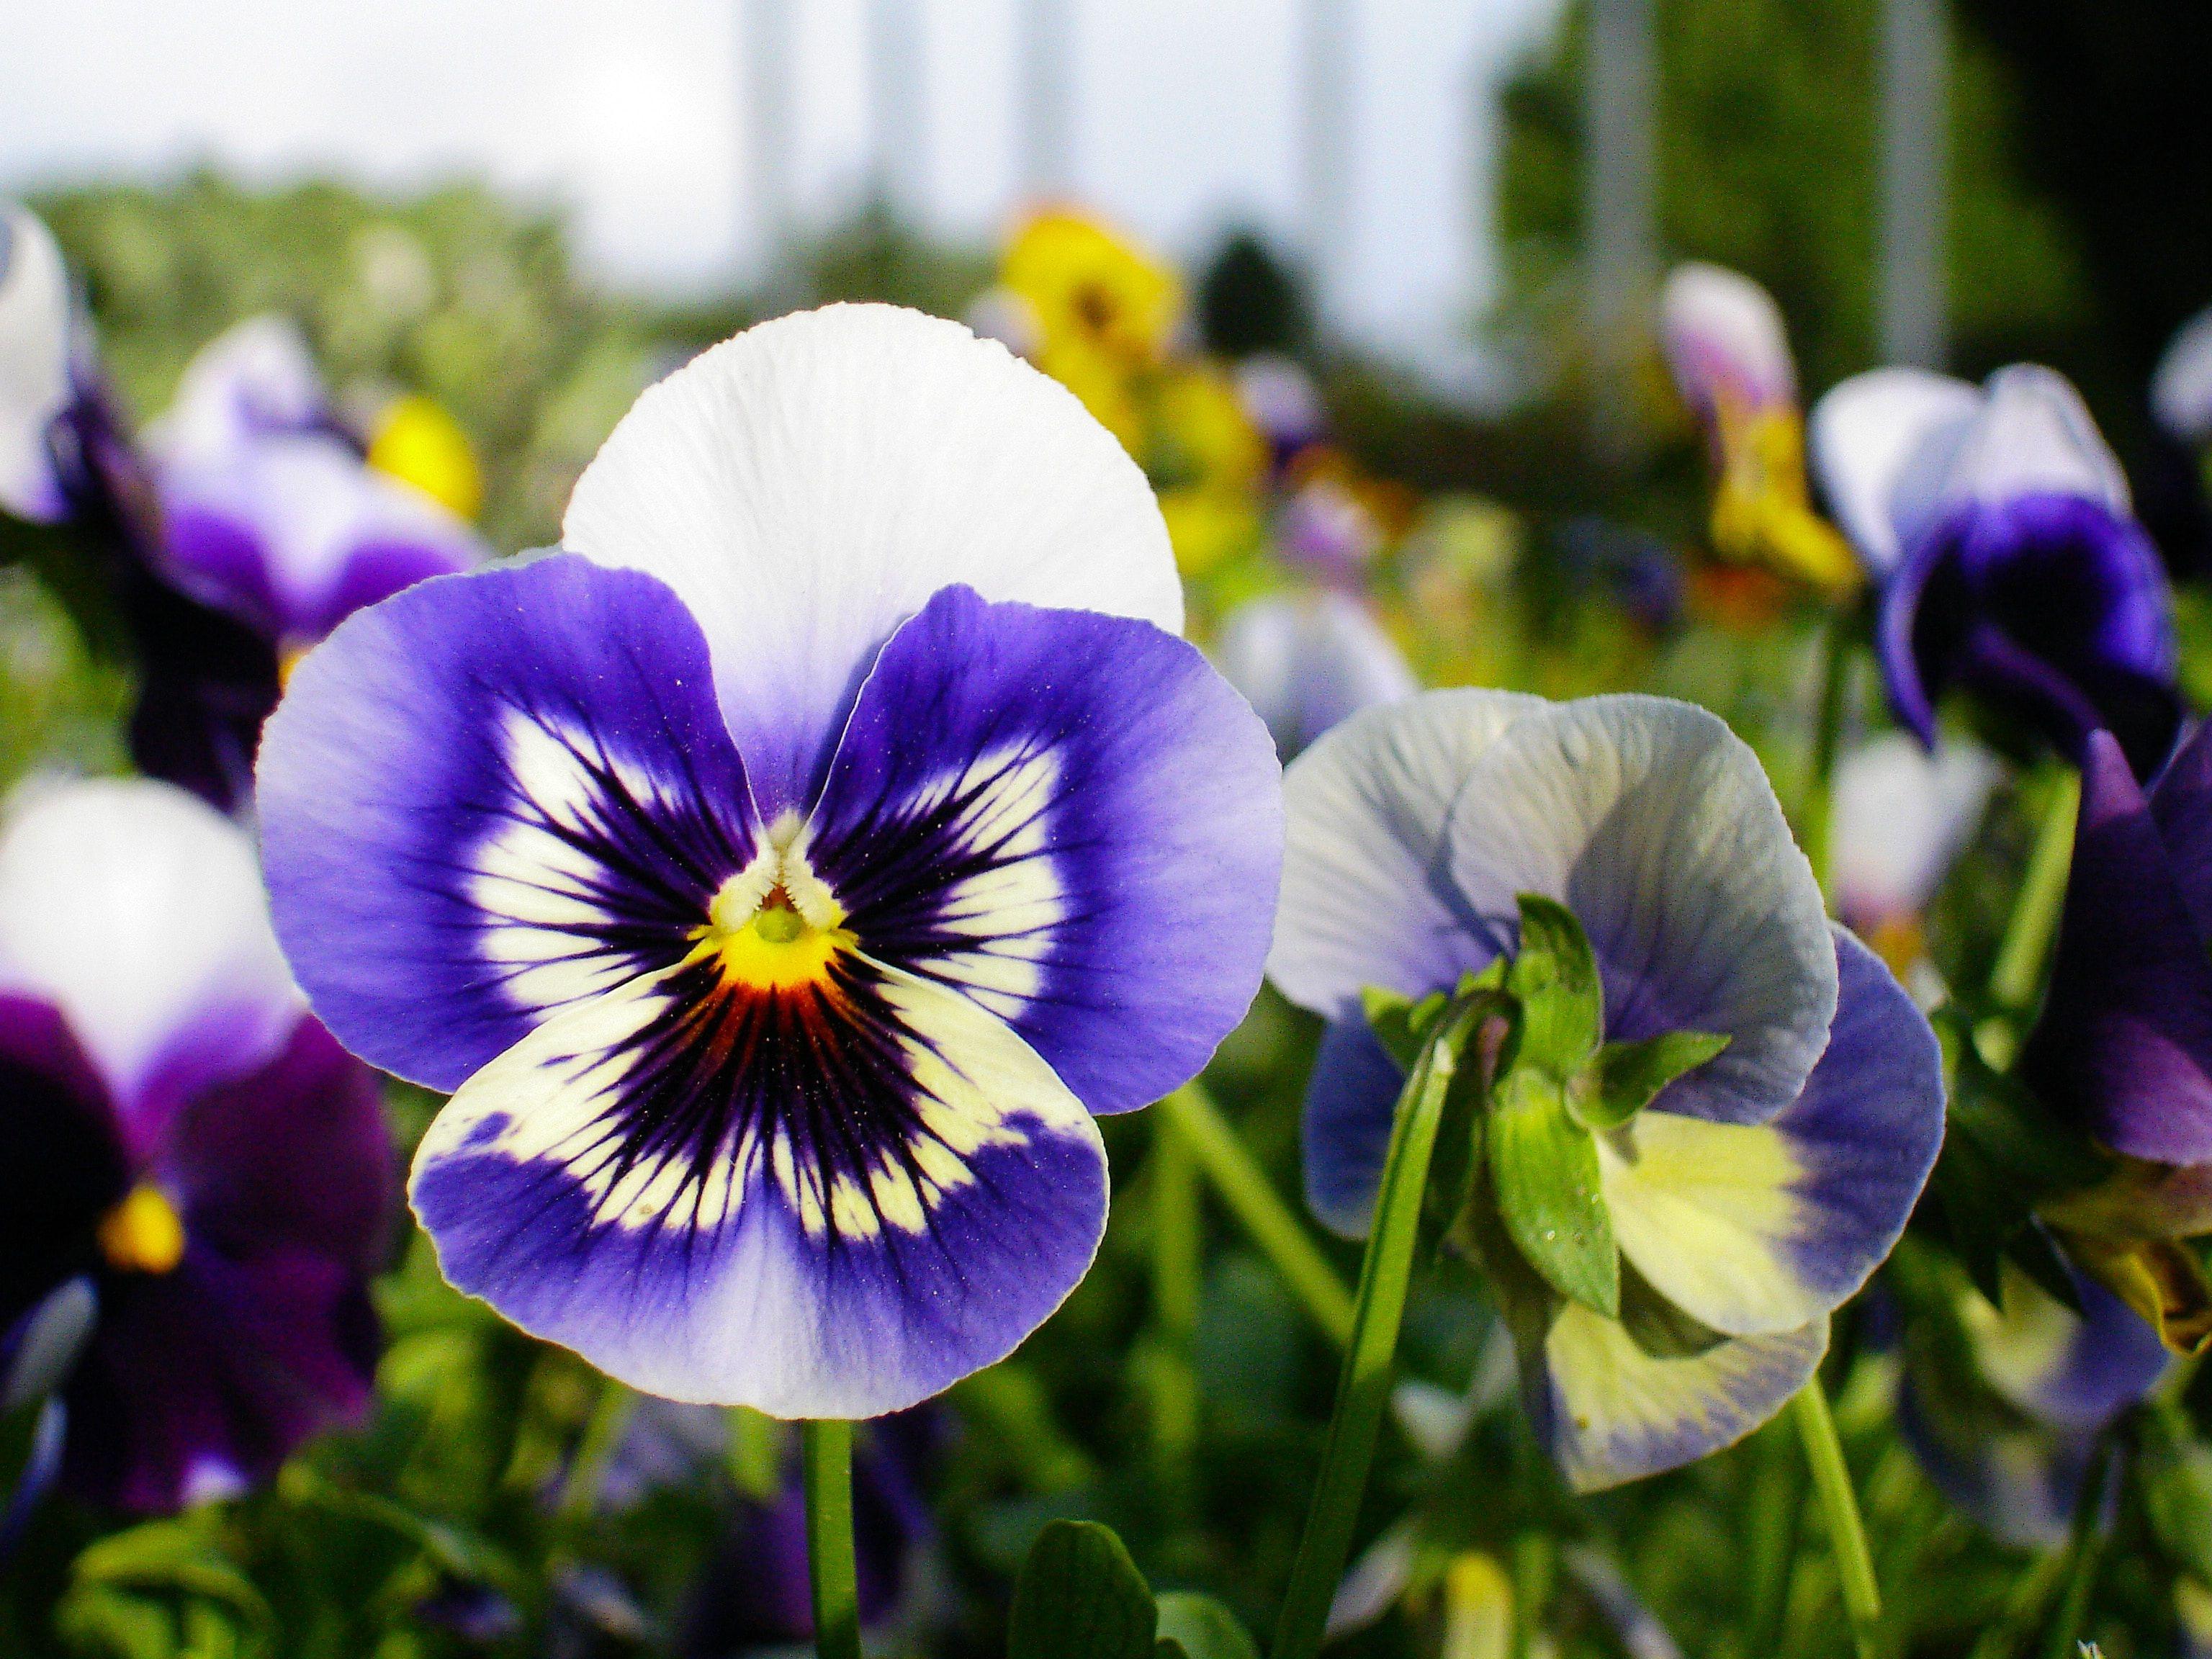 Pansies In 2020 Edible Flower Garden List Of Edible Flowers Autumn Garden